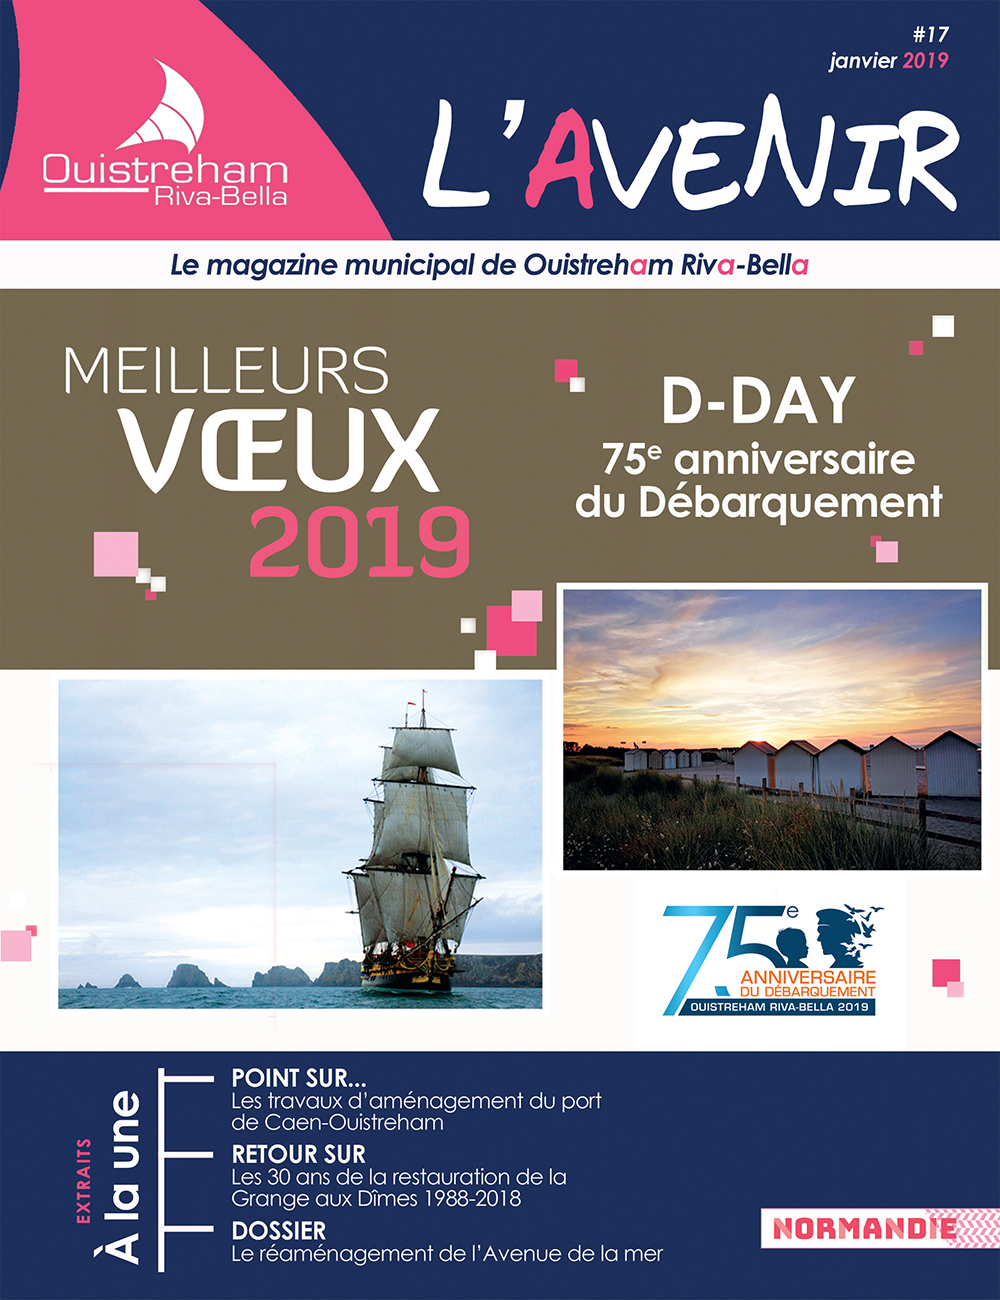 Magazine municipal - L'Avenir n°17 - Ouistreham Riva-Bella - janvier 2019